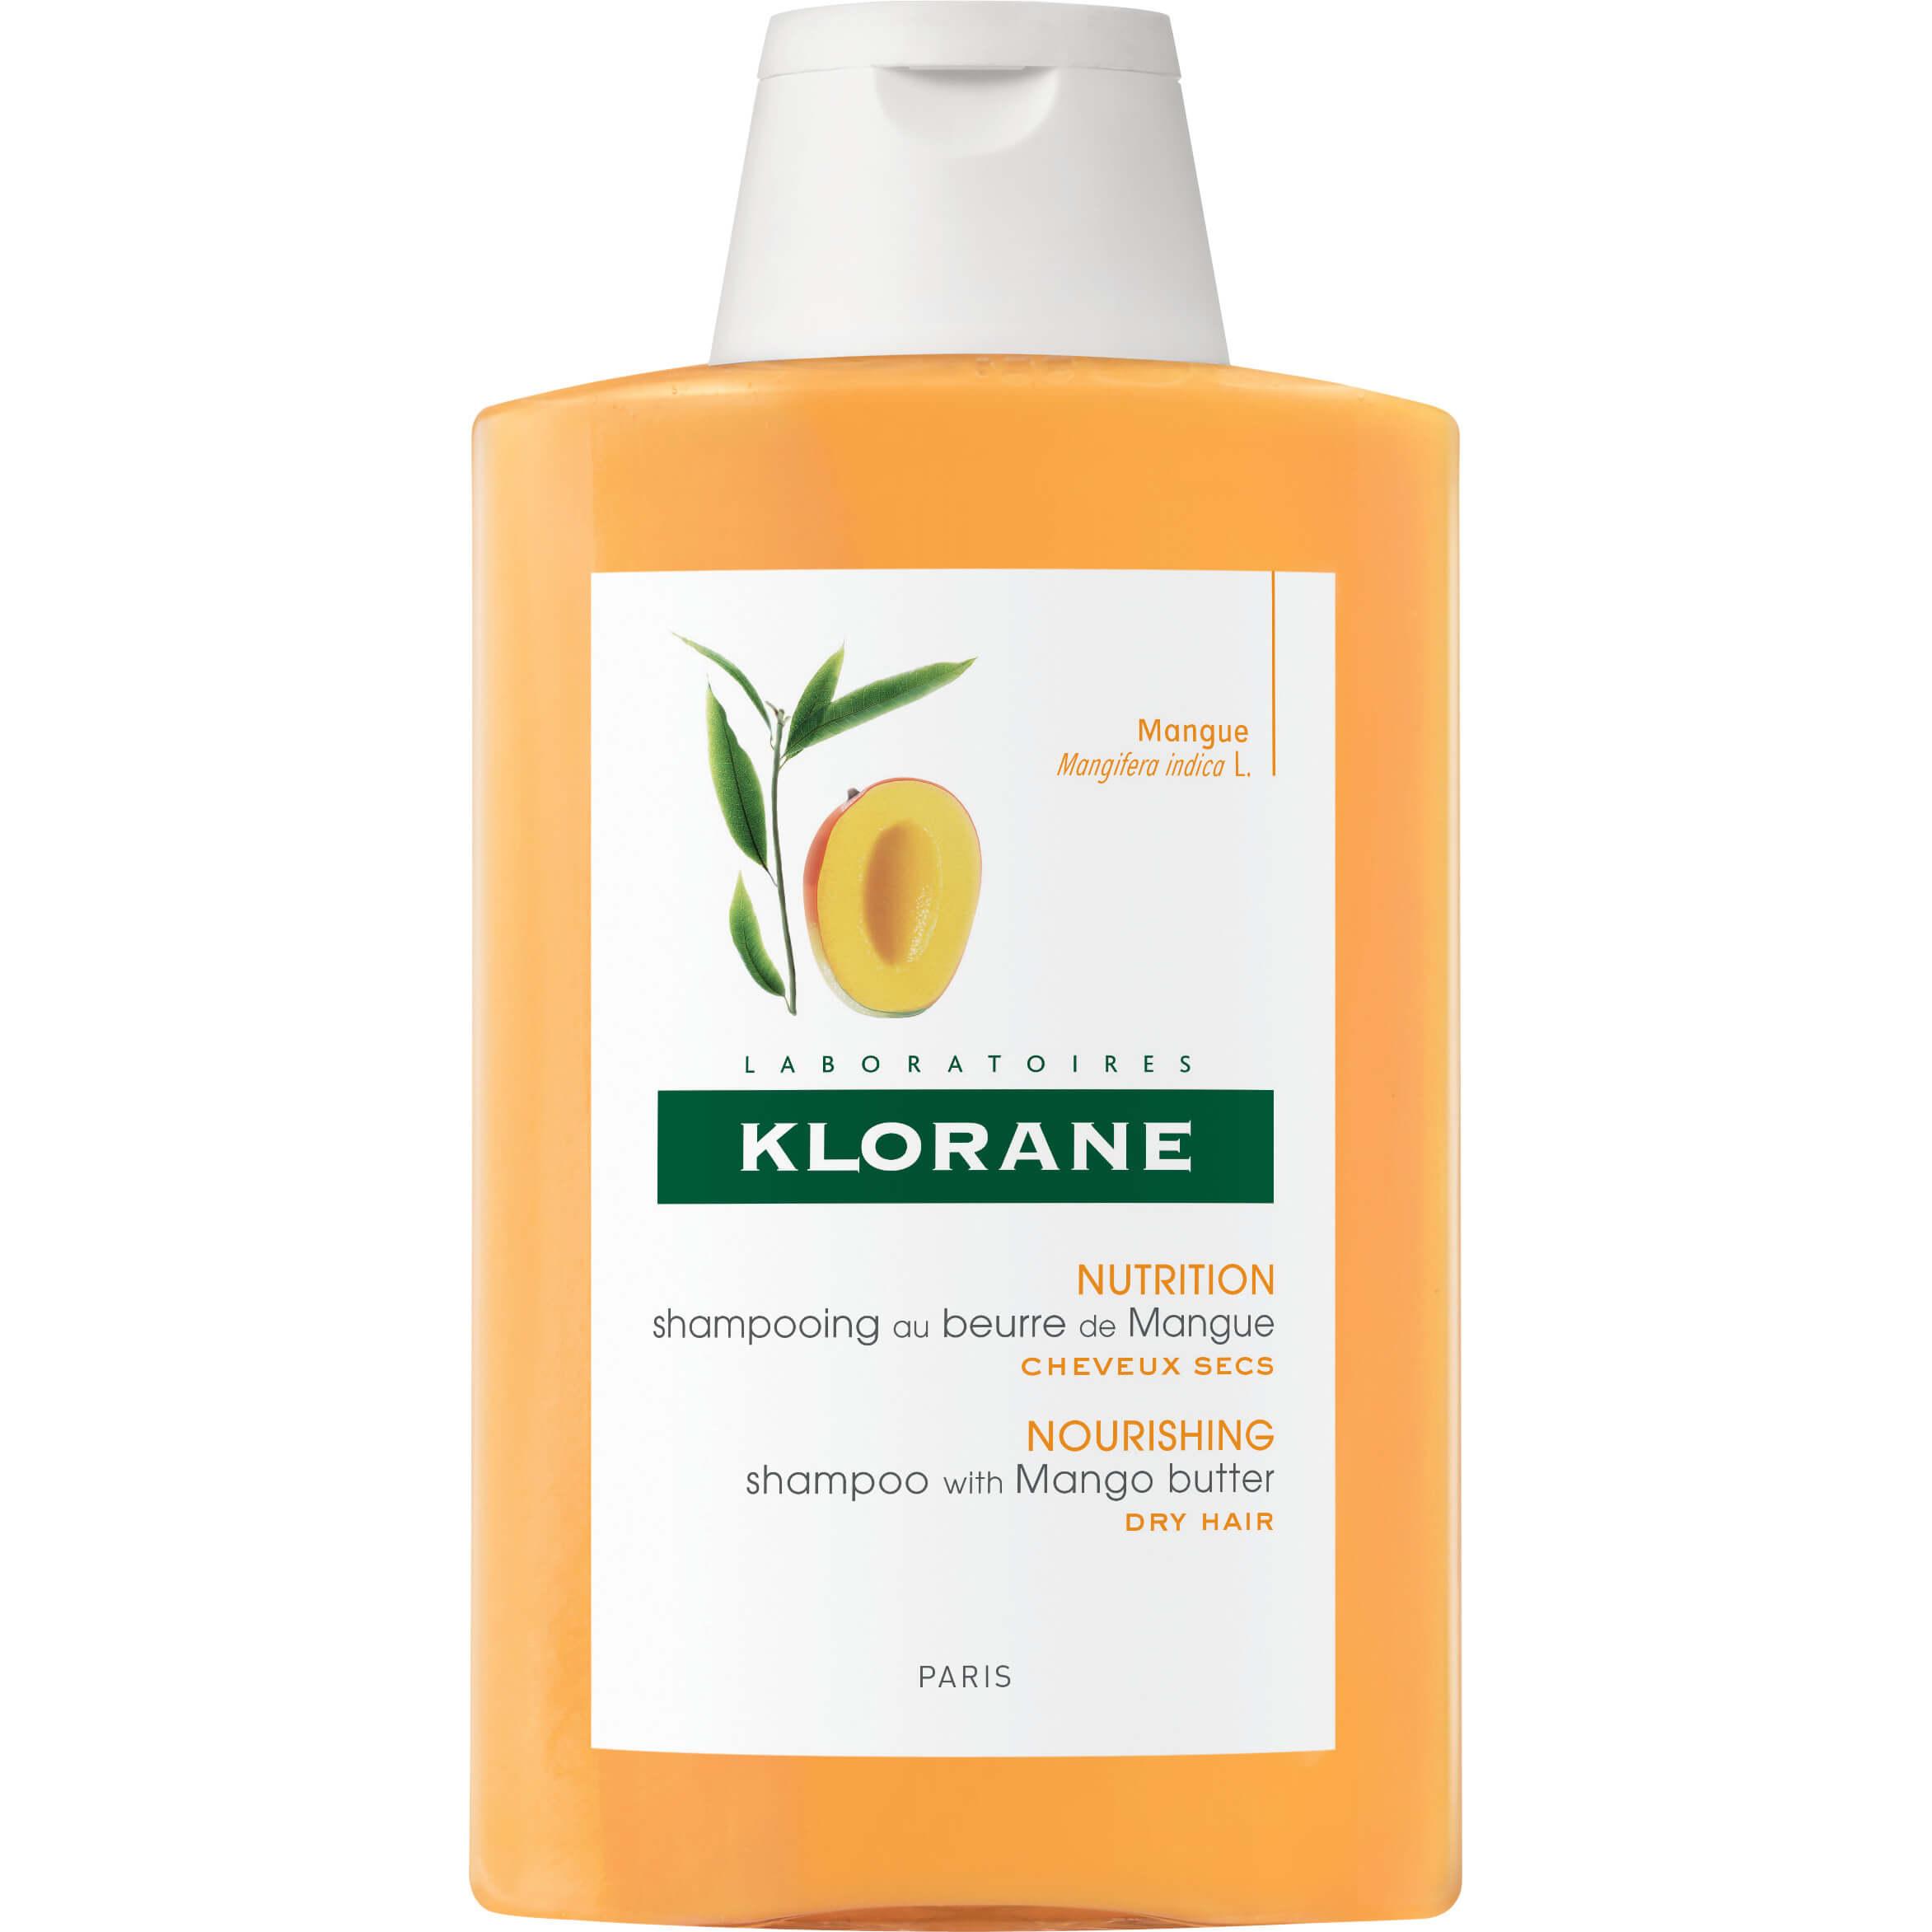 Klorane Mangue Shampoo, Σαμπουάν με Μάνγκο για Ξηρά – Ταλαιπωρημένα Μαλλιά 200ml / 400ml – 400ml